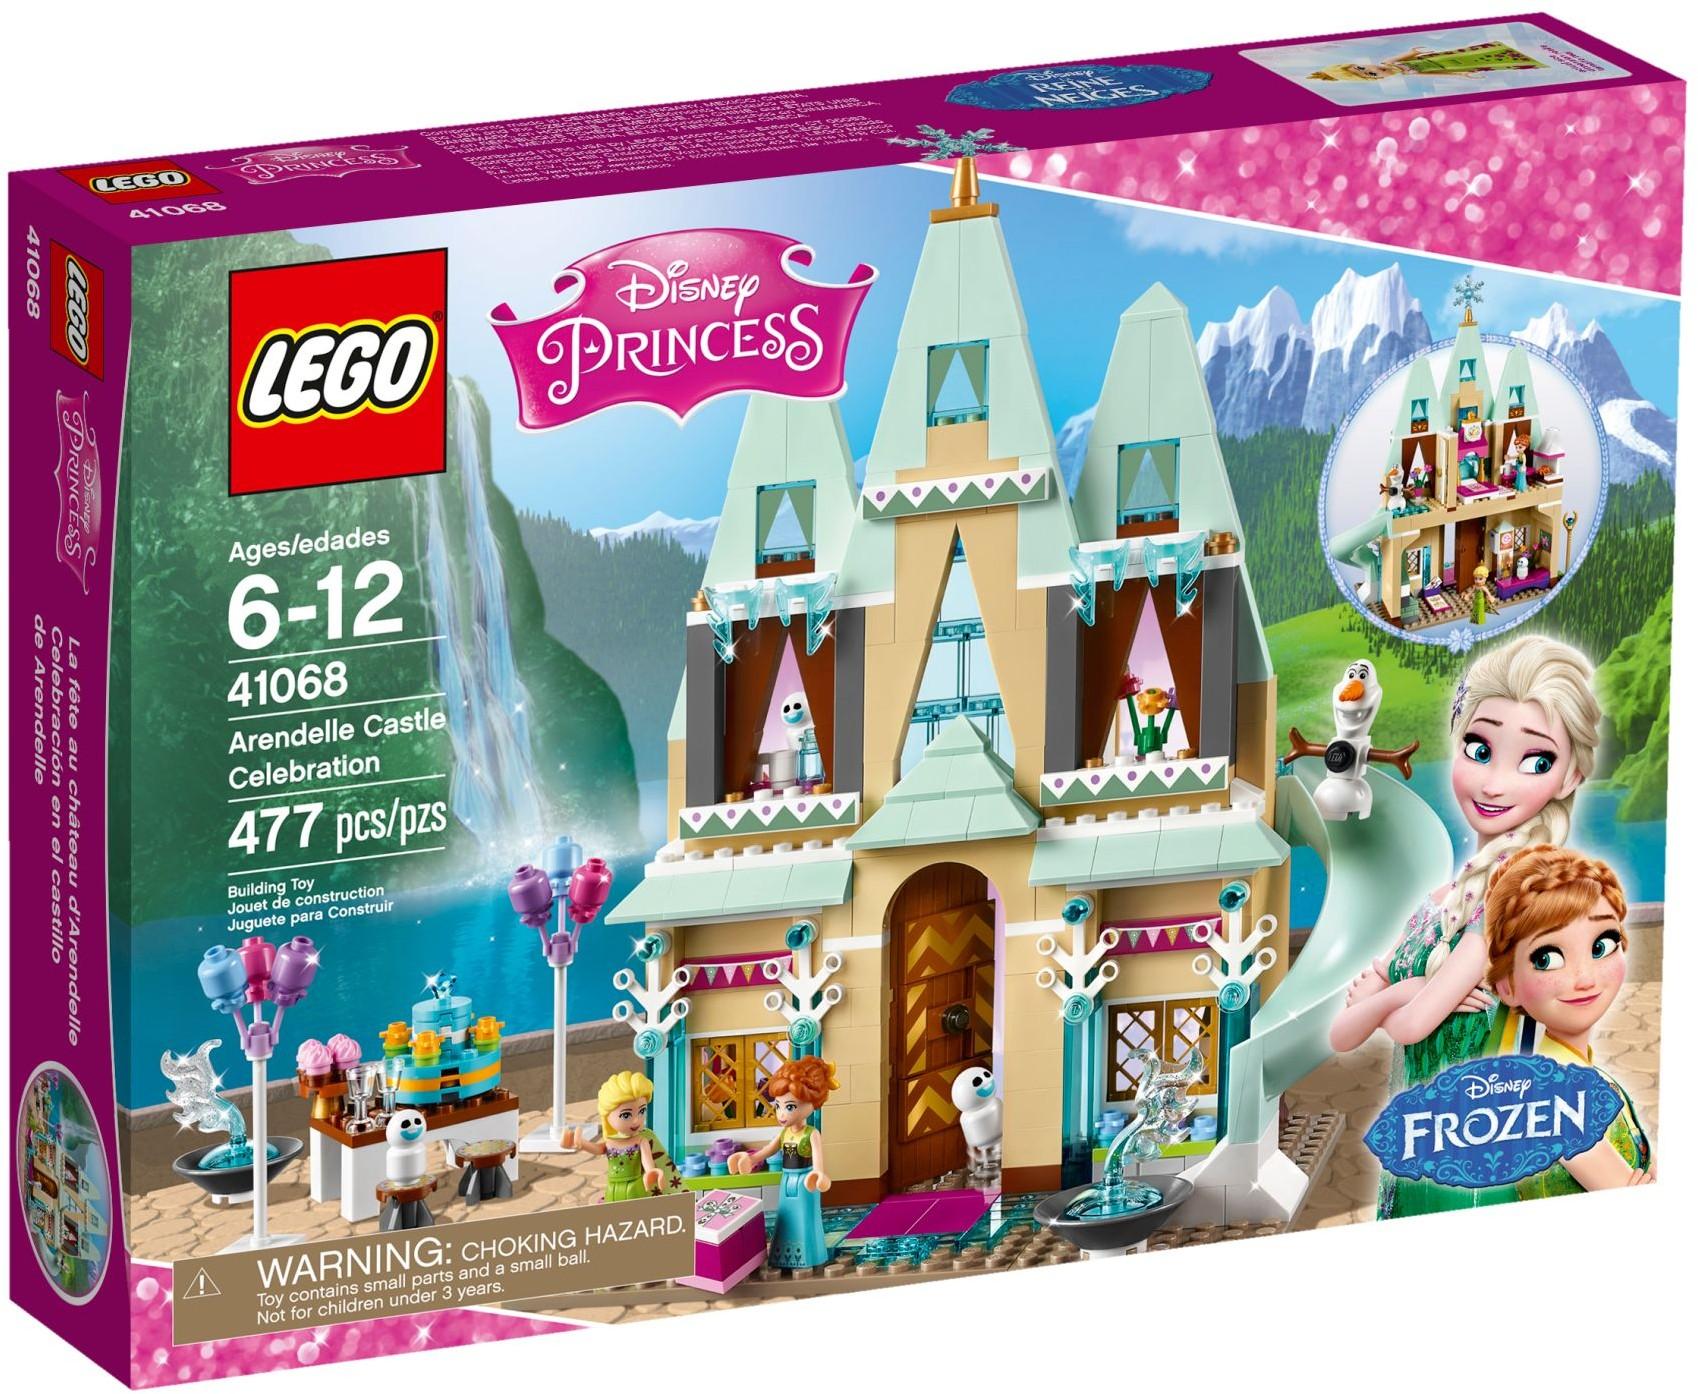 LEGO 41068 - Disney Princess - Arendelle Castle Celebration